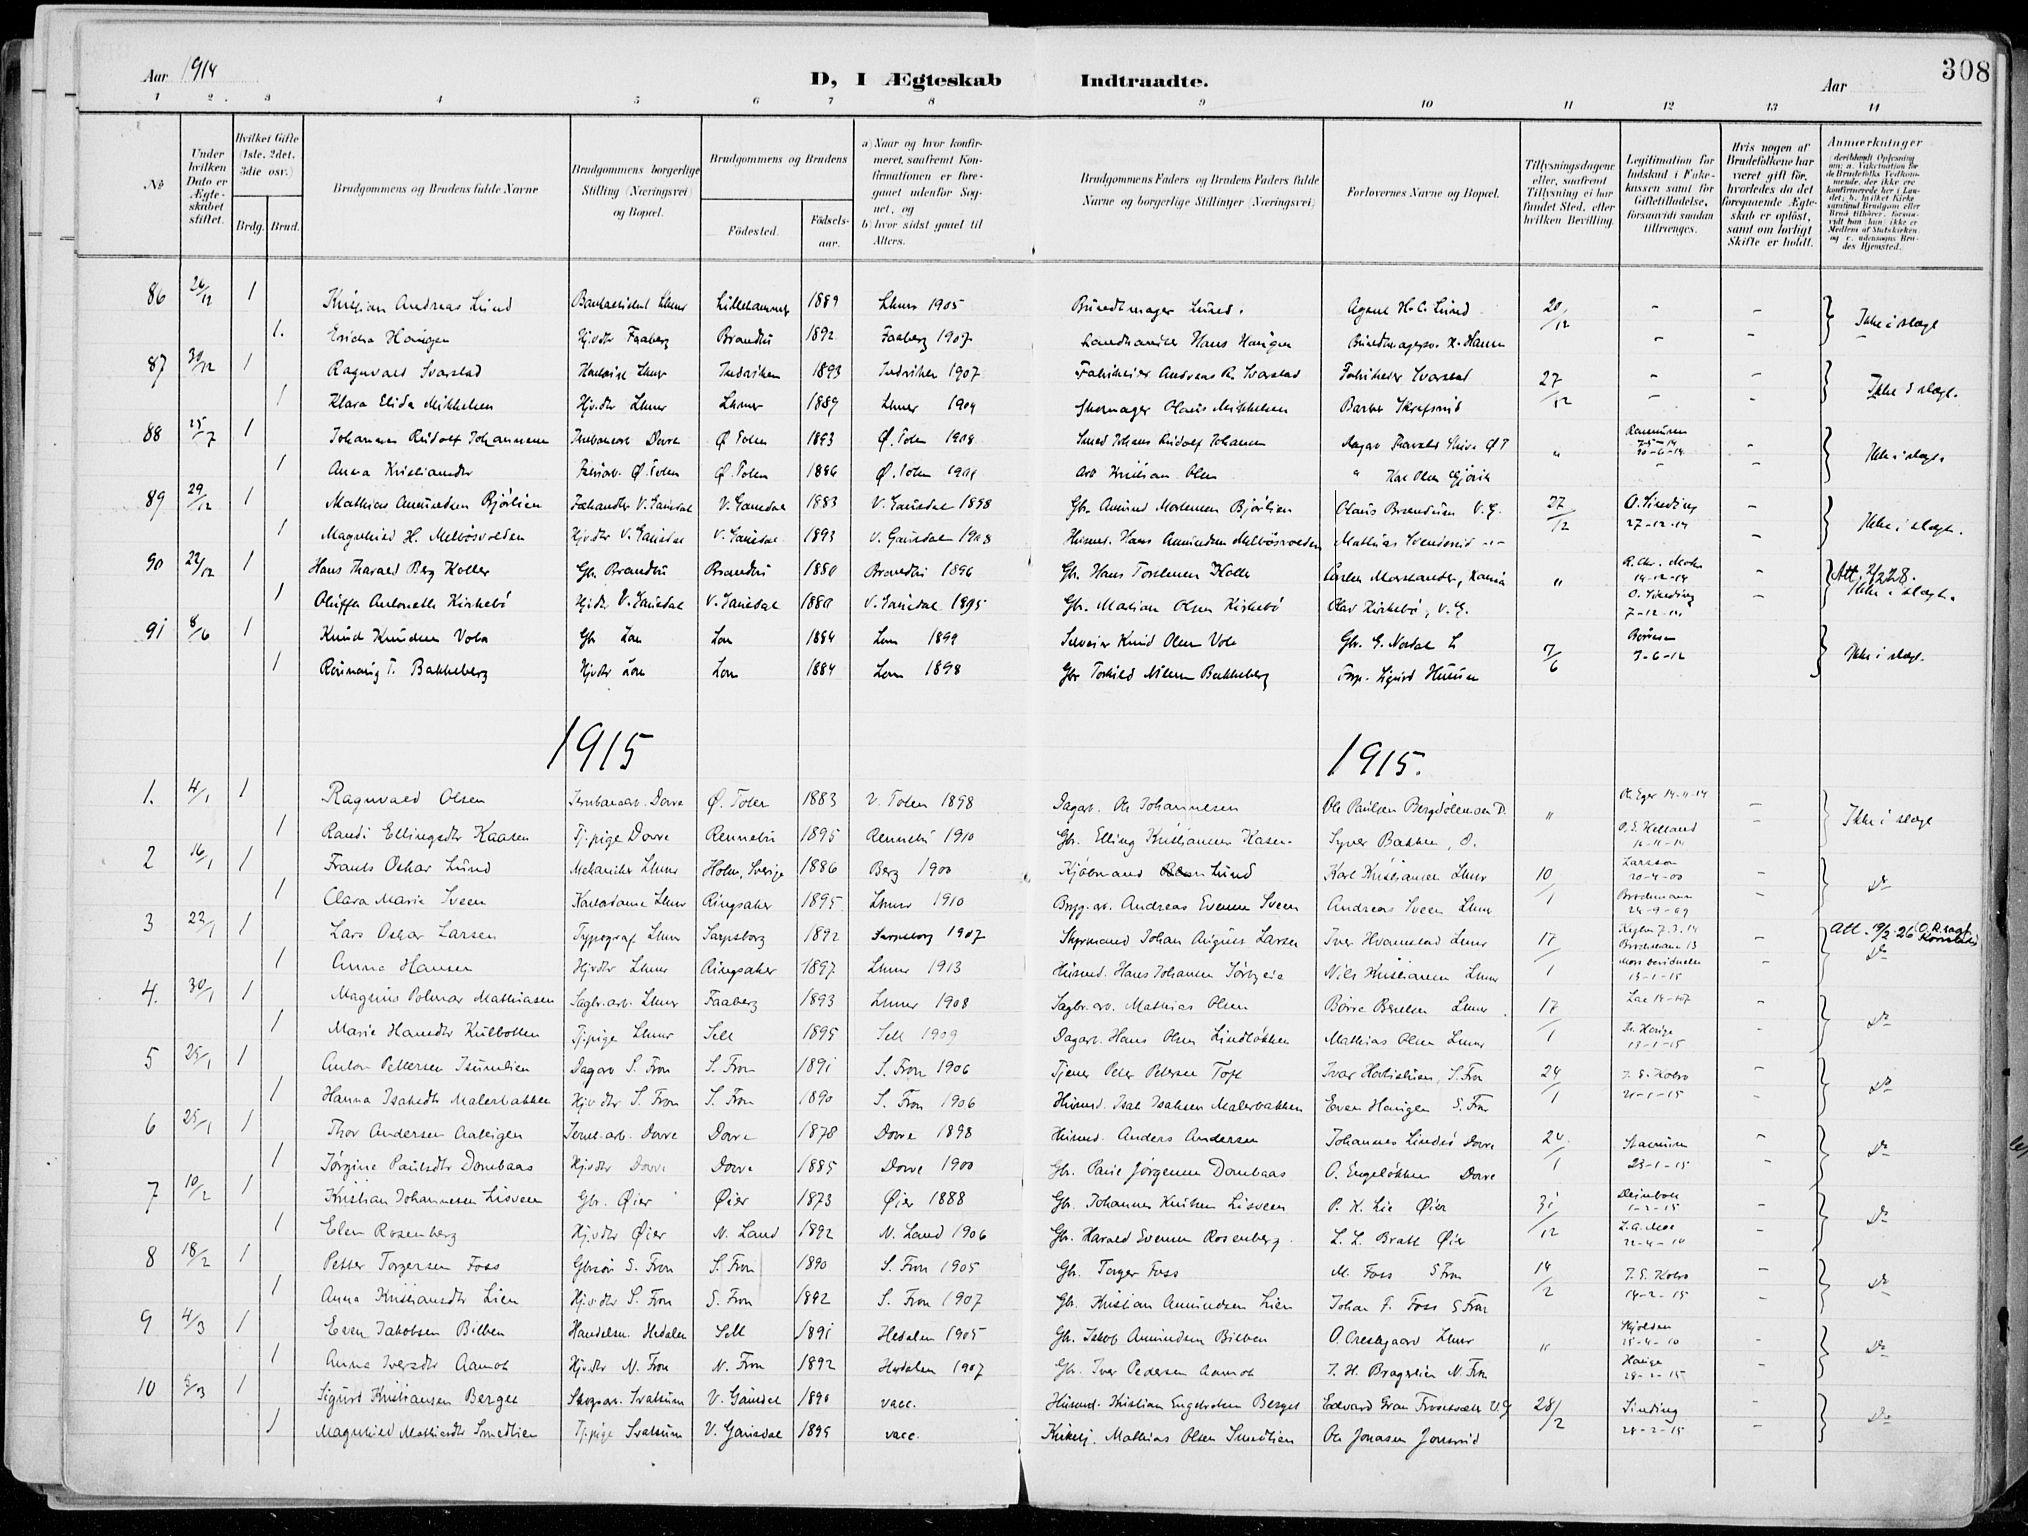 SAH, Lillehammer prestekontor, Ministerialbok nr. 1, 1901-1916, s. 308